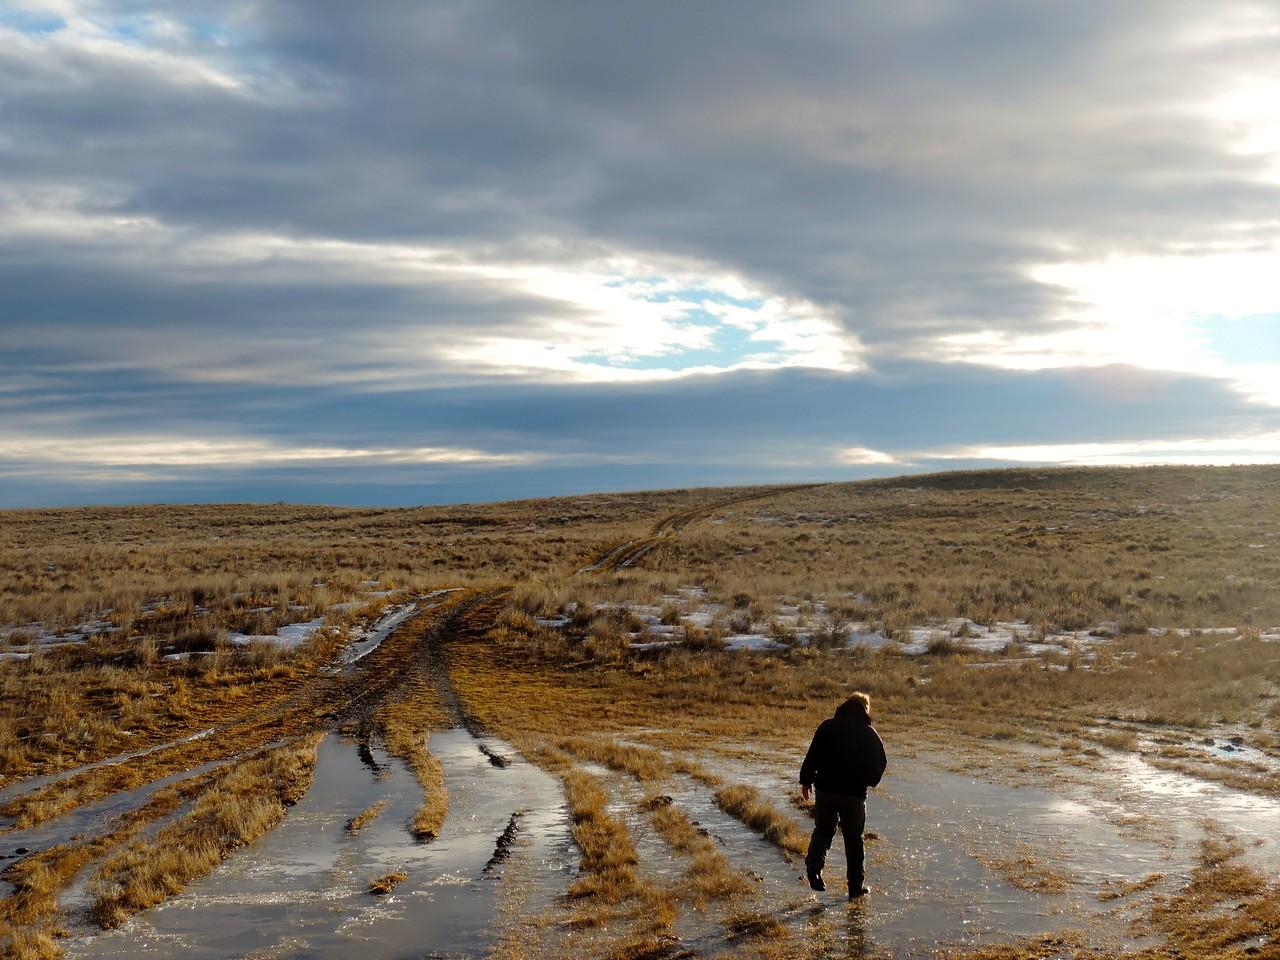 Zach McKeown hiking a transect on APR (photo by Caroline Hedin